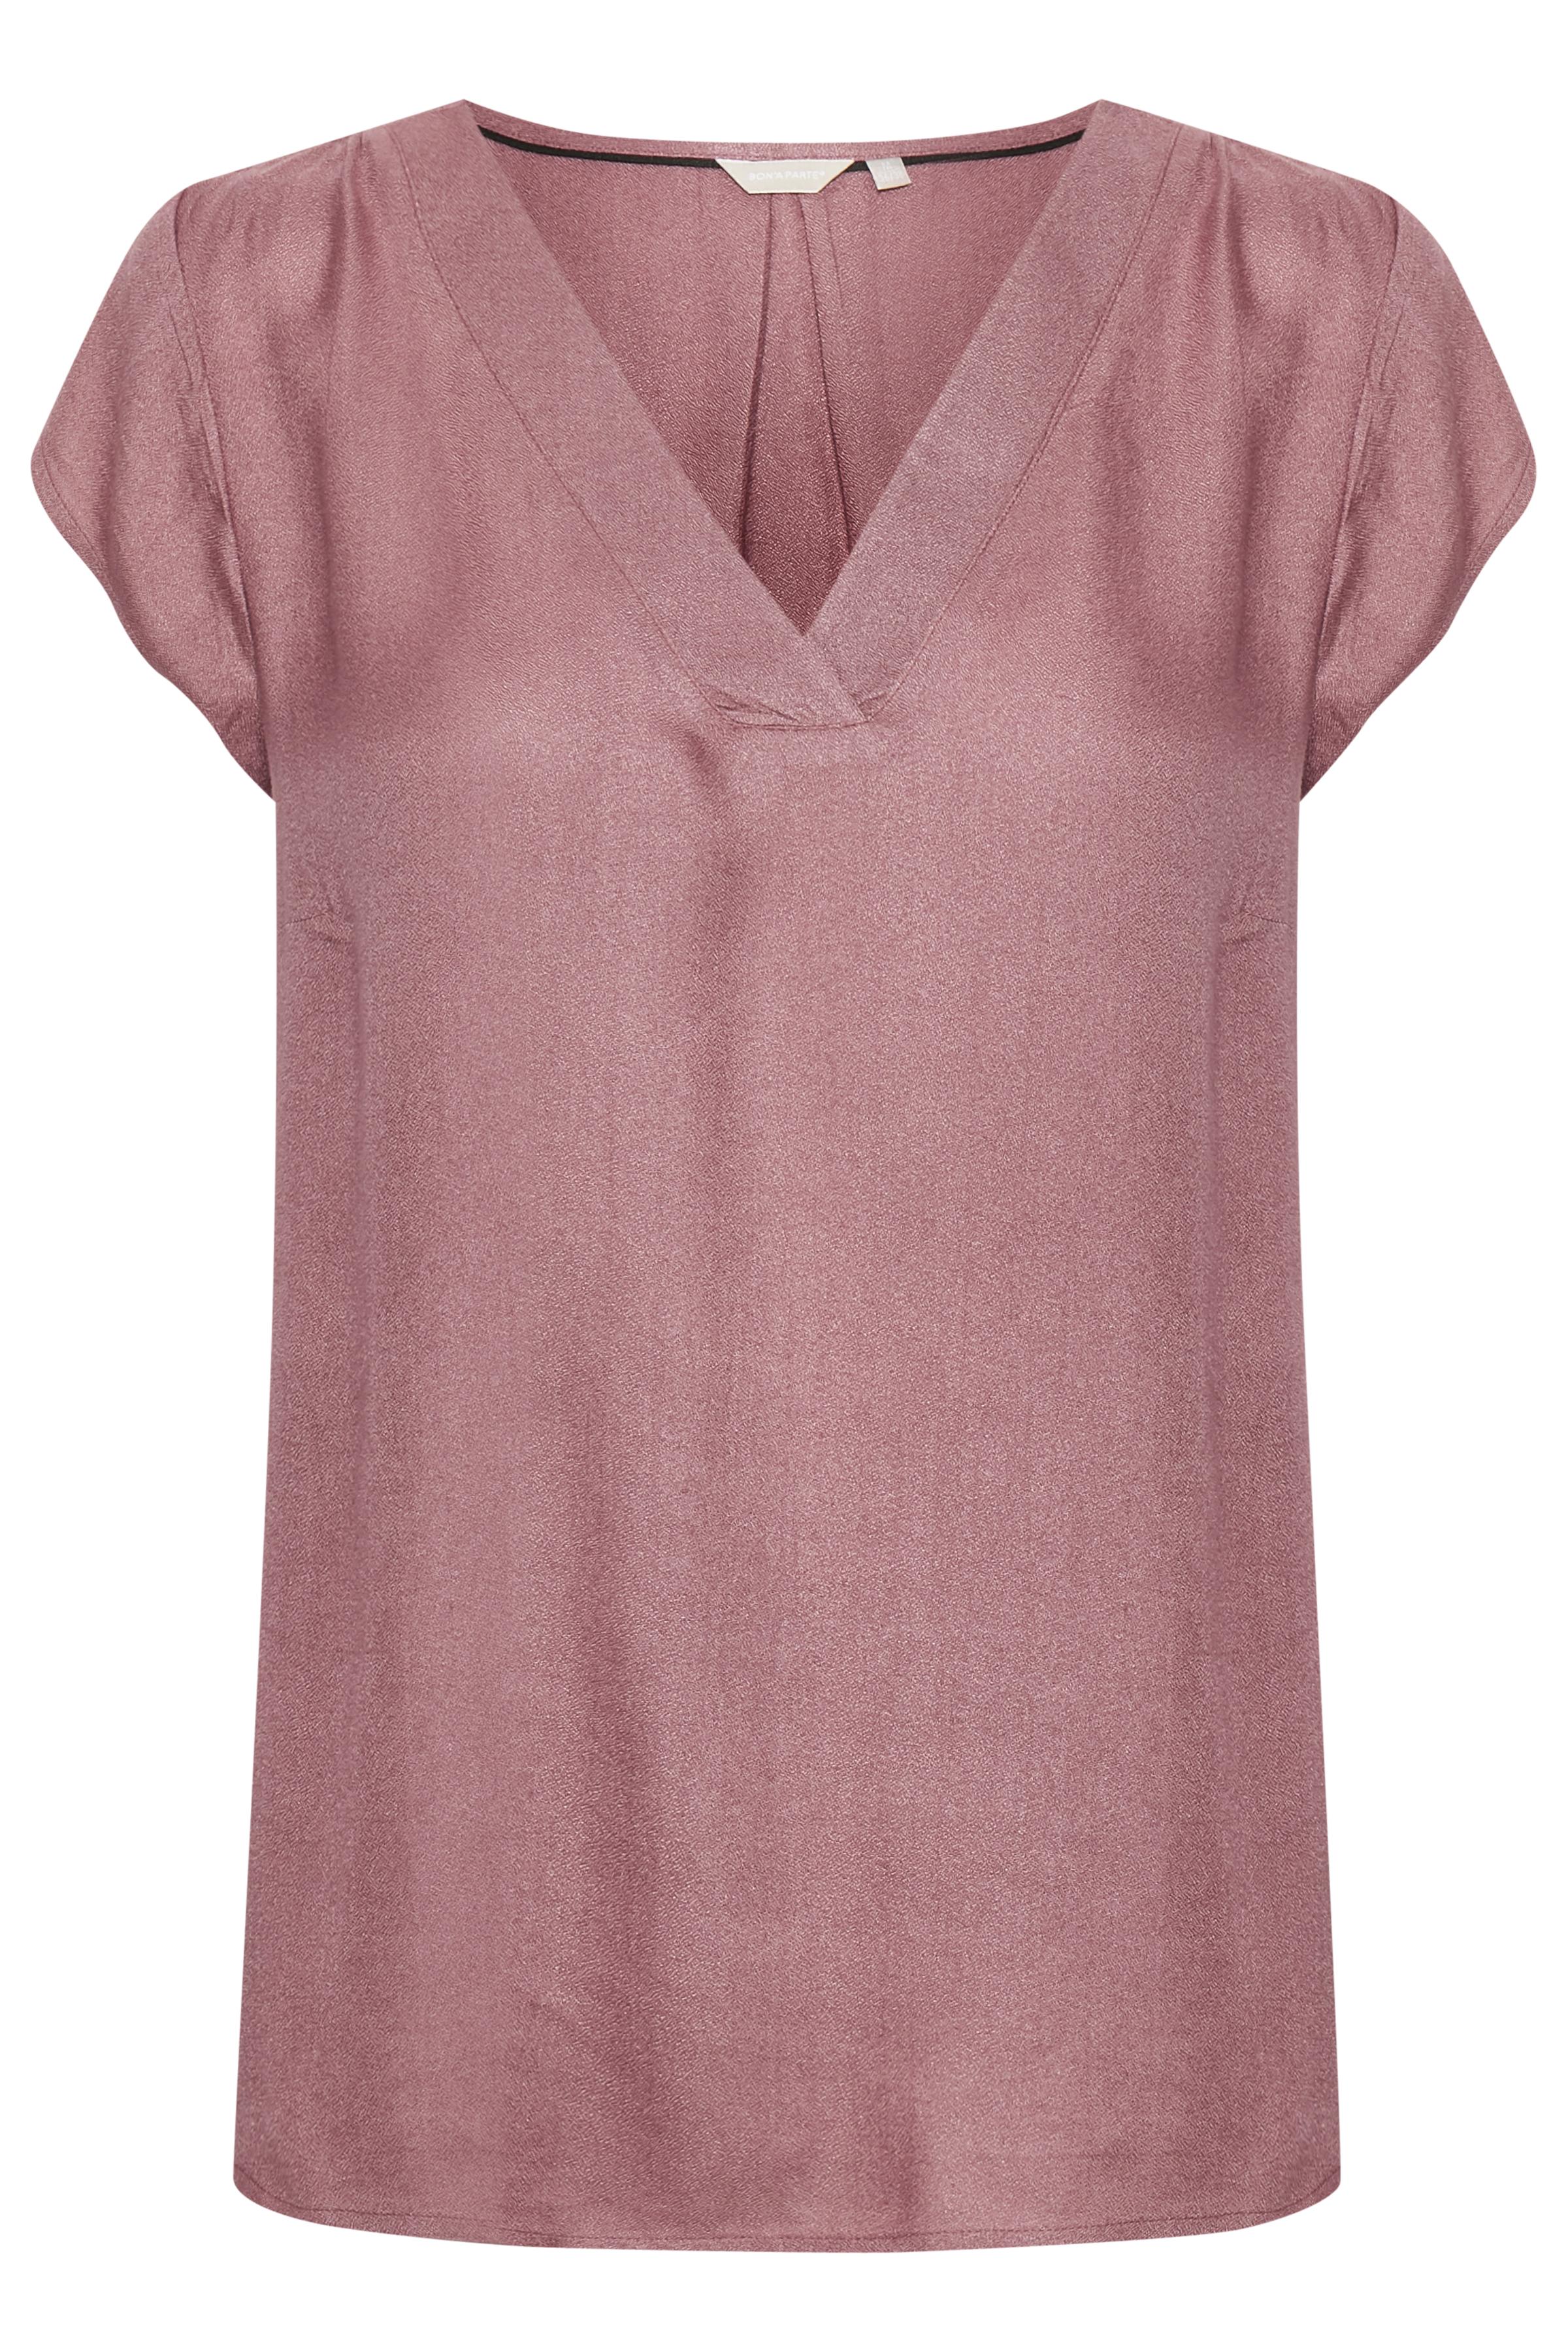 Misty heide Korte mouwen shirt  van Bon'A Parte – Door Misty heide Korte mouwen shirt  van maat. S-2XL hier